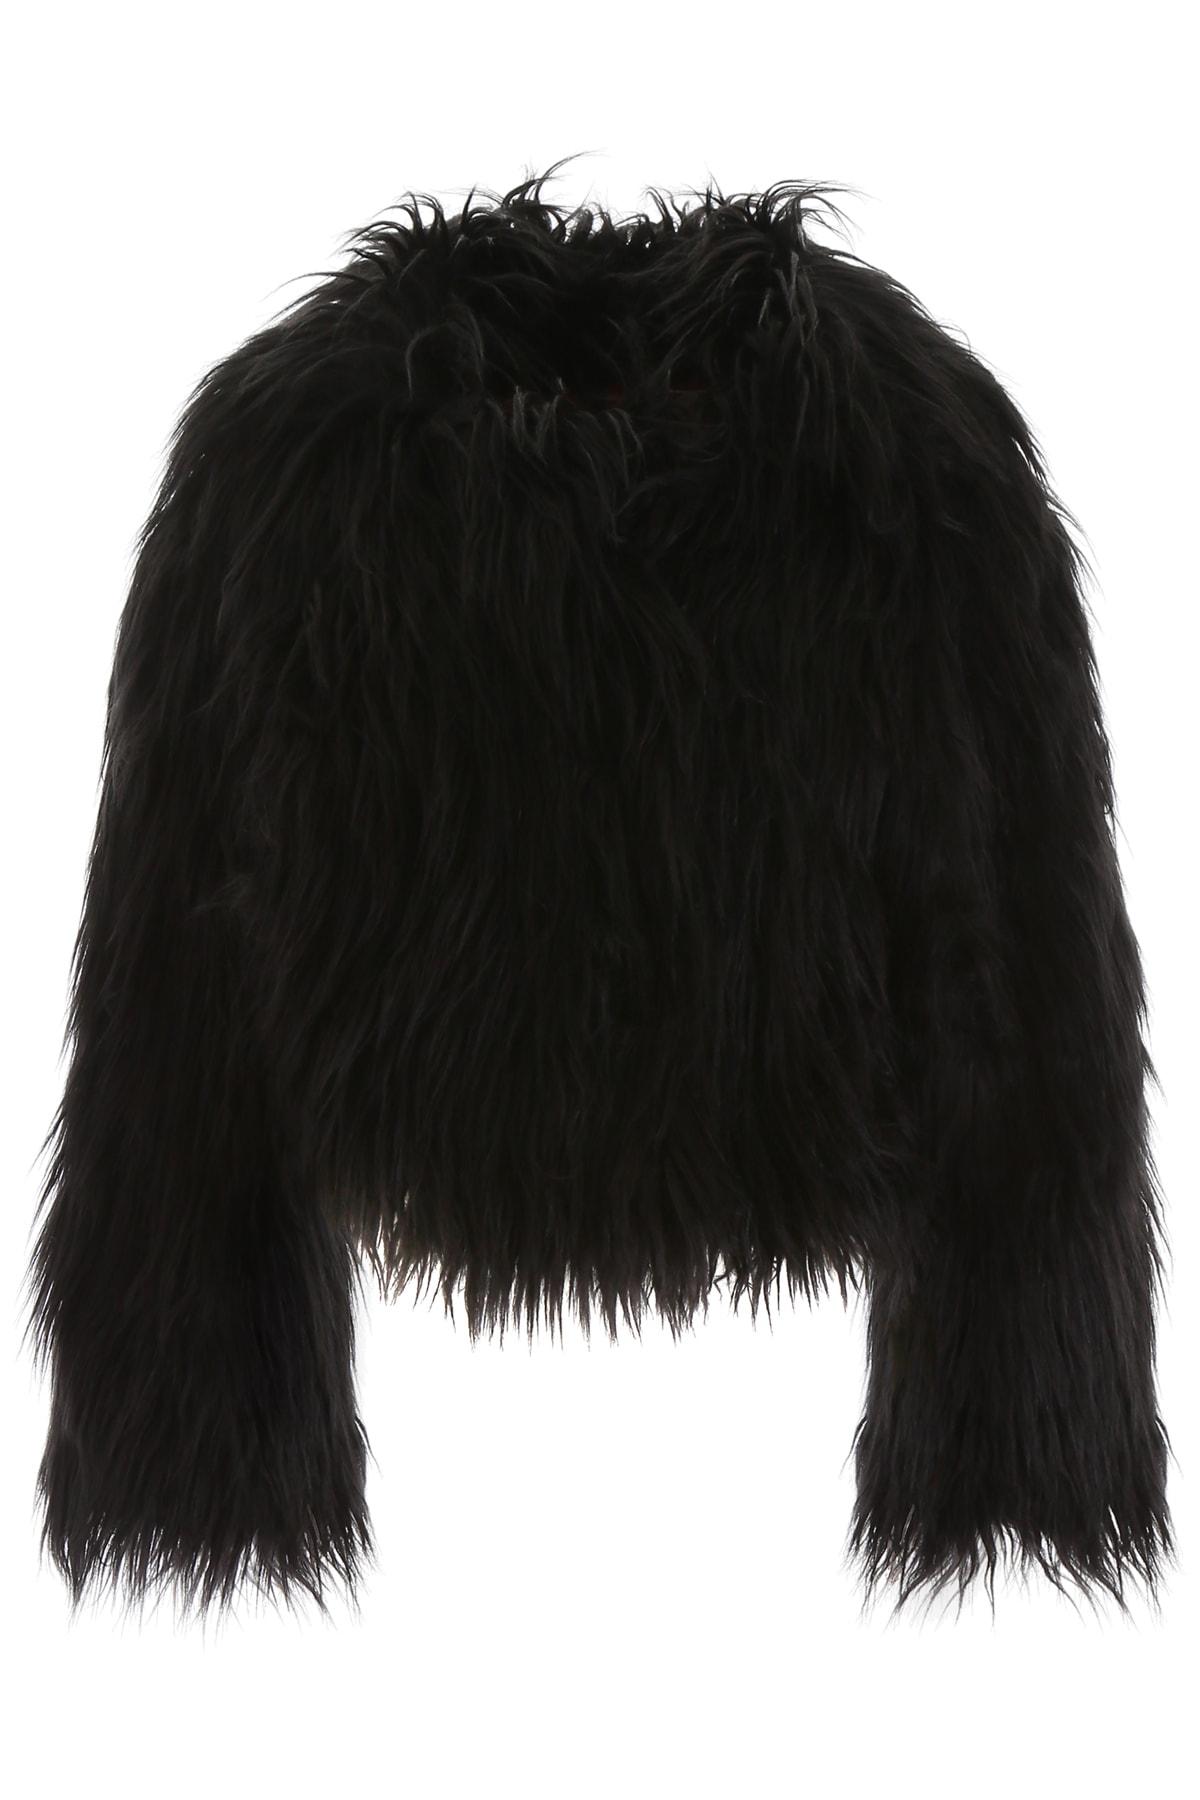 Philosophy di Lorenzo Serafini Faux Fur Jacket